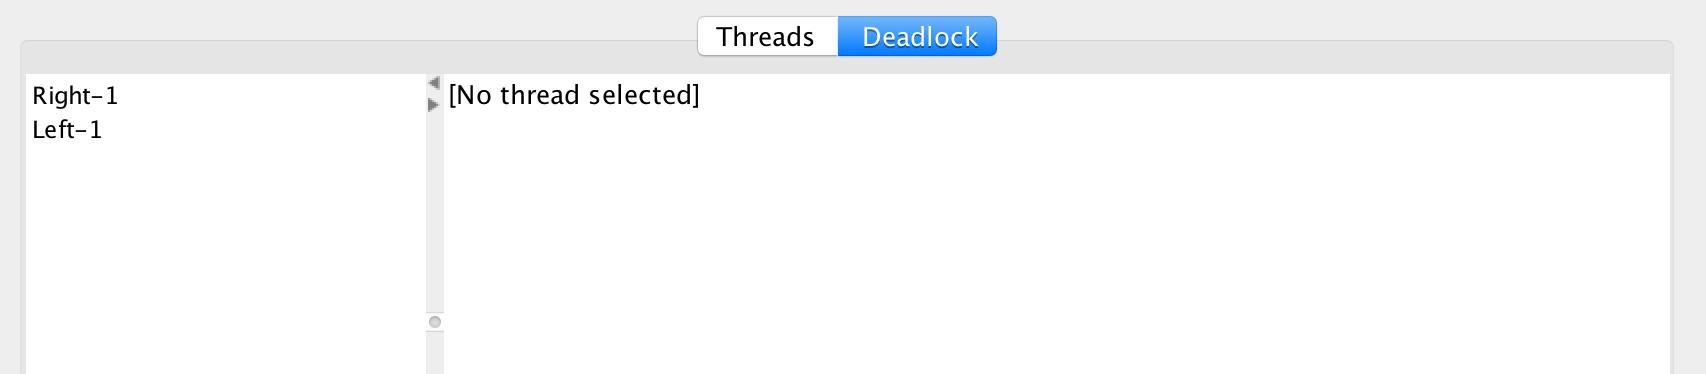 jconsole_deadlock_screen